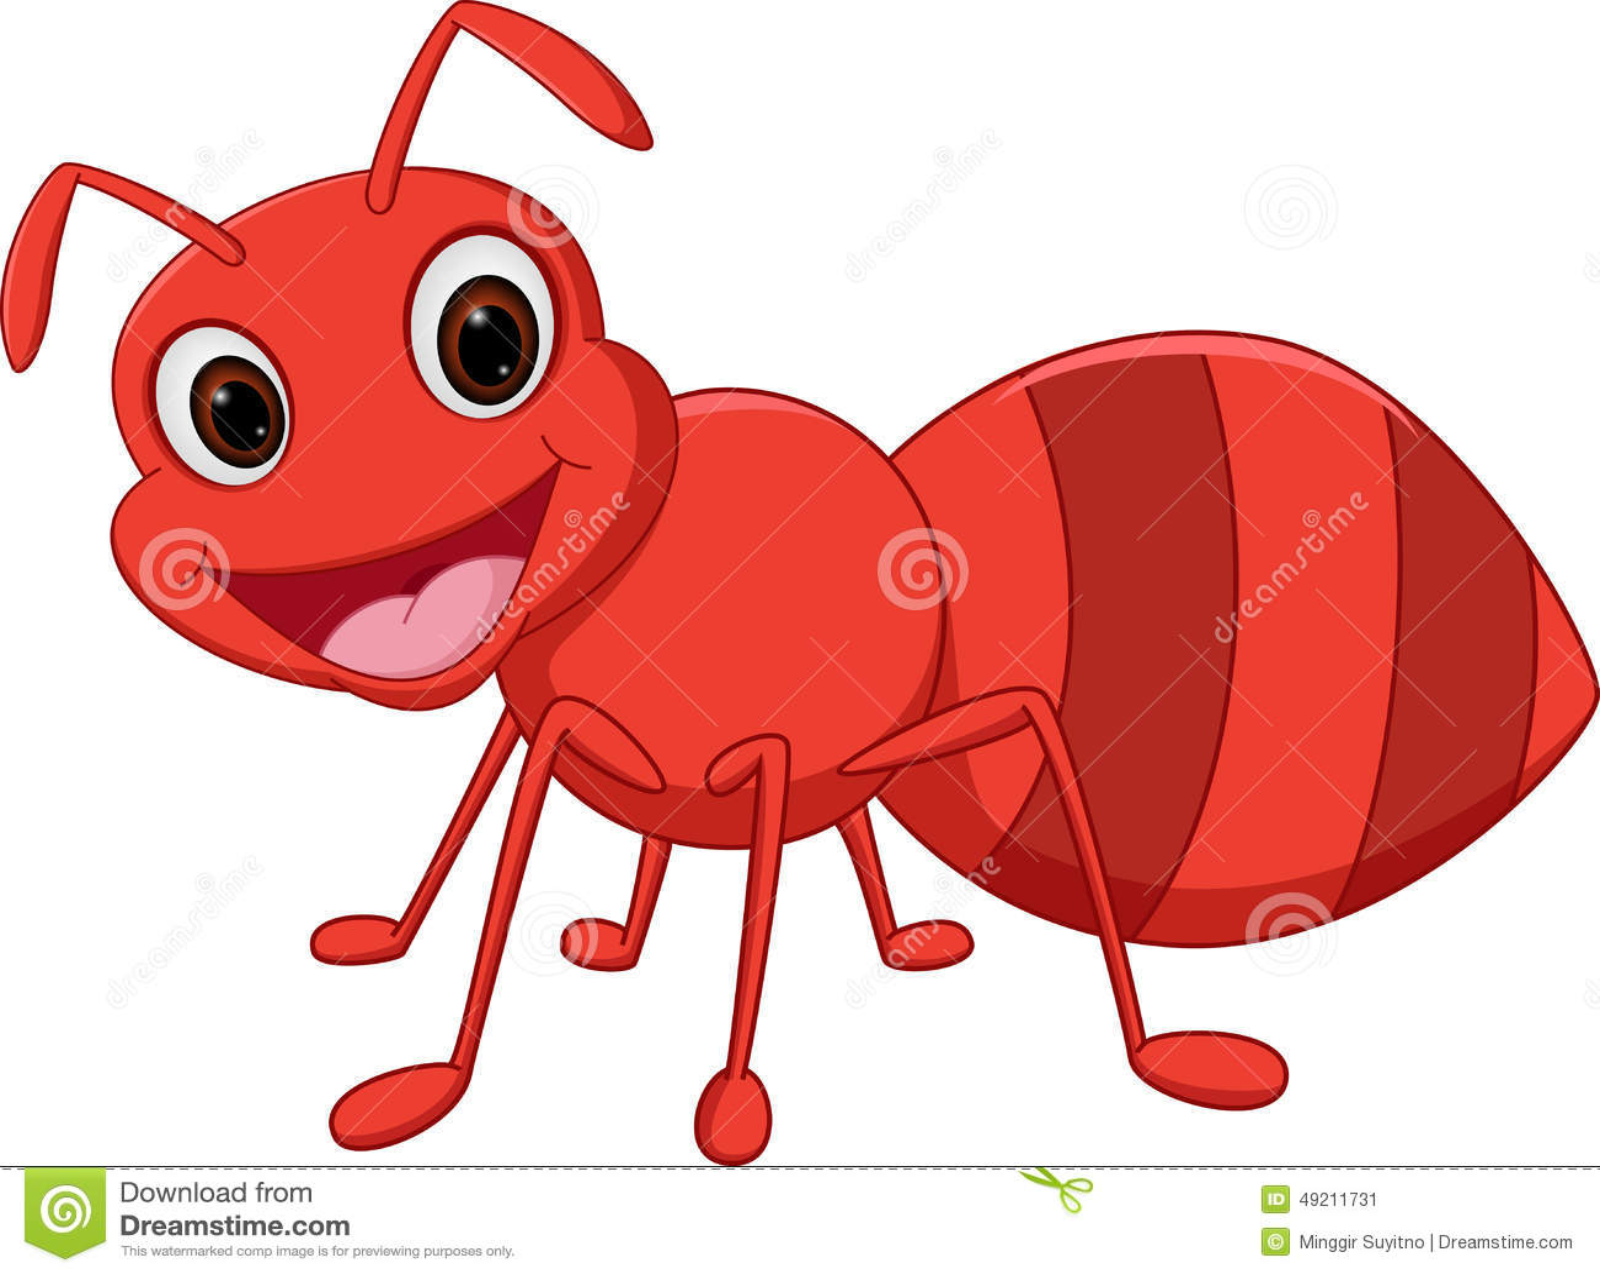 Illustration of Happy ant cartoon isolated on white.